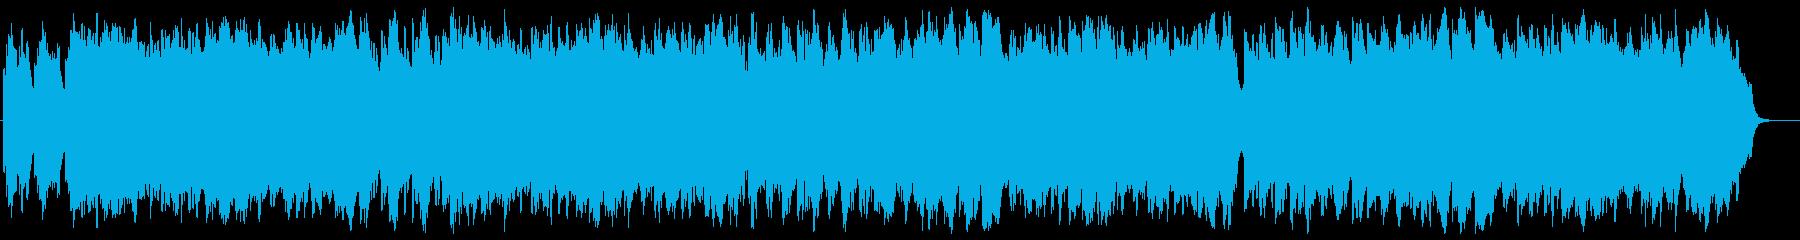 Wedding march (Mendelssohn)'s reproduced waveform